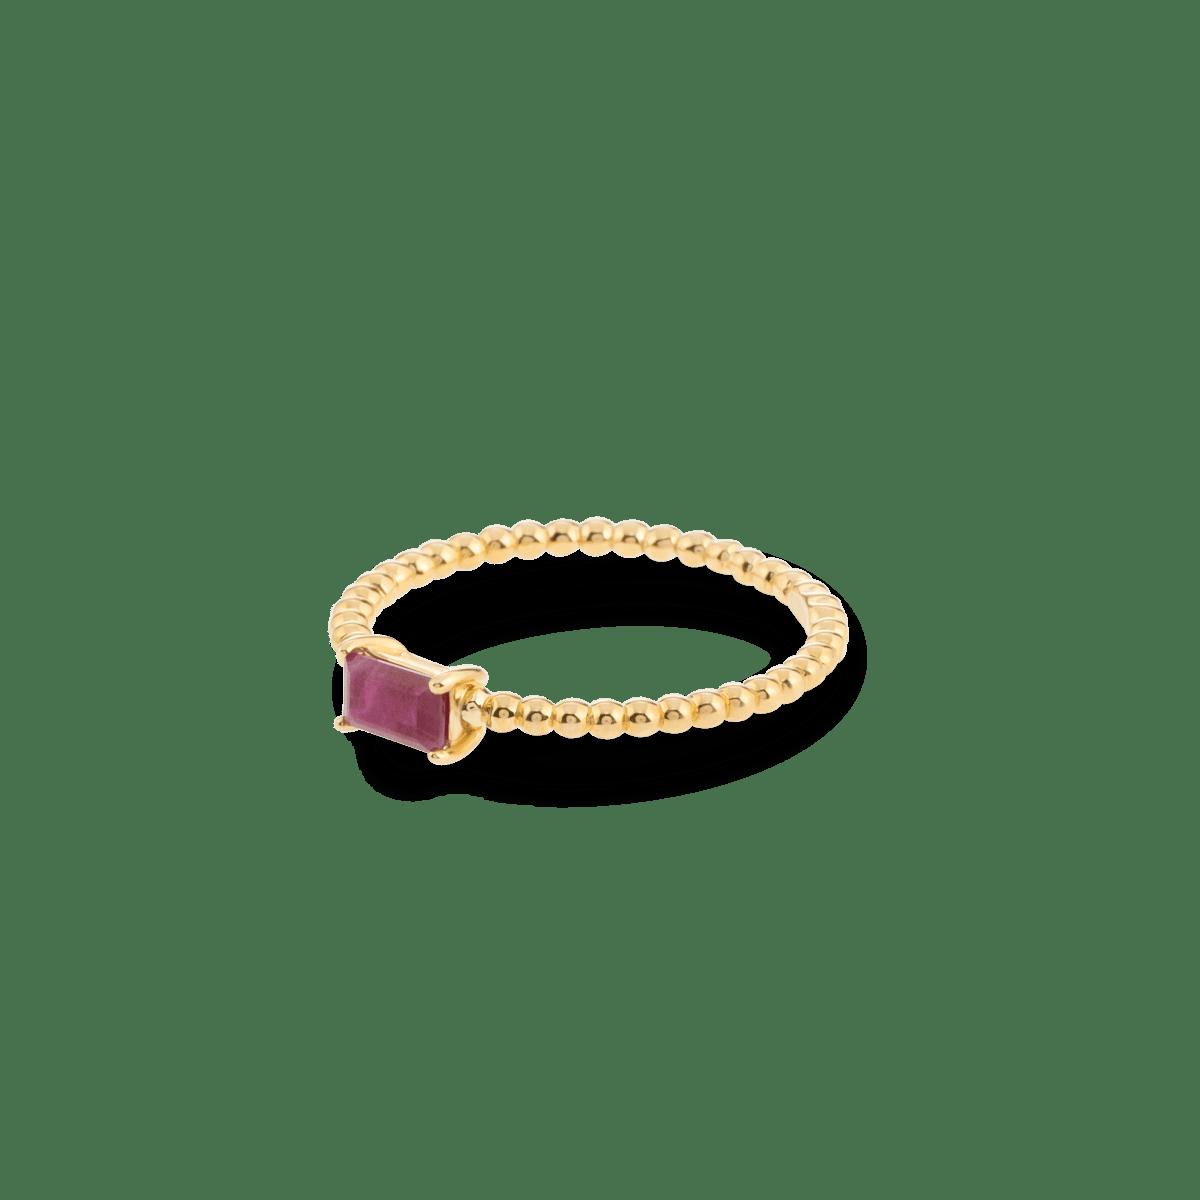 Bubble Birthstone Ring 9K gold juli